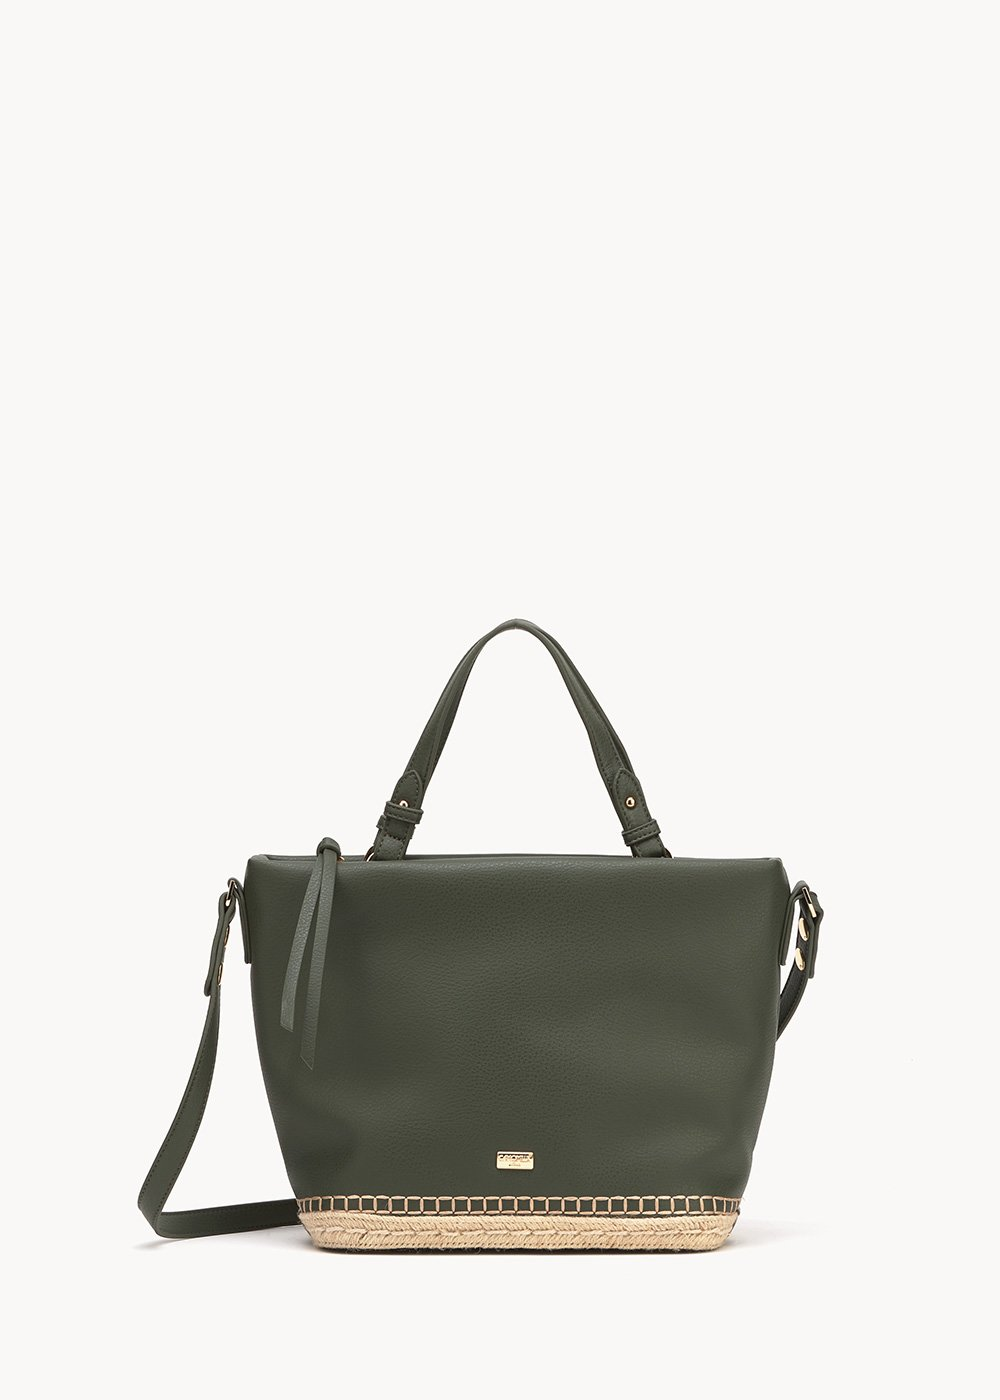 Beltran shopping bag with woven bottom - Green - Woman